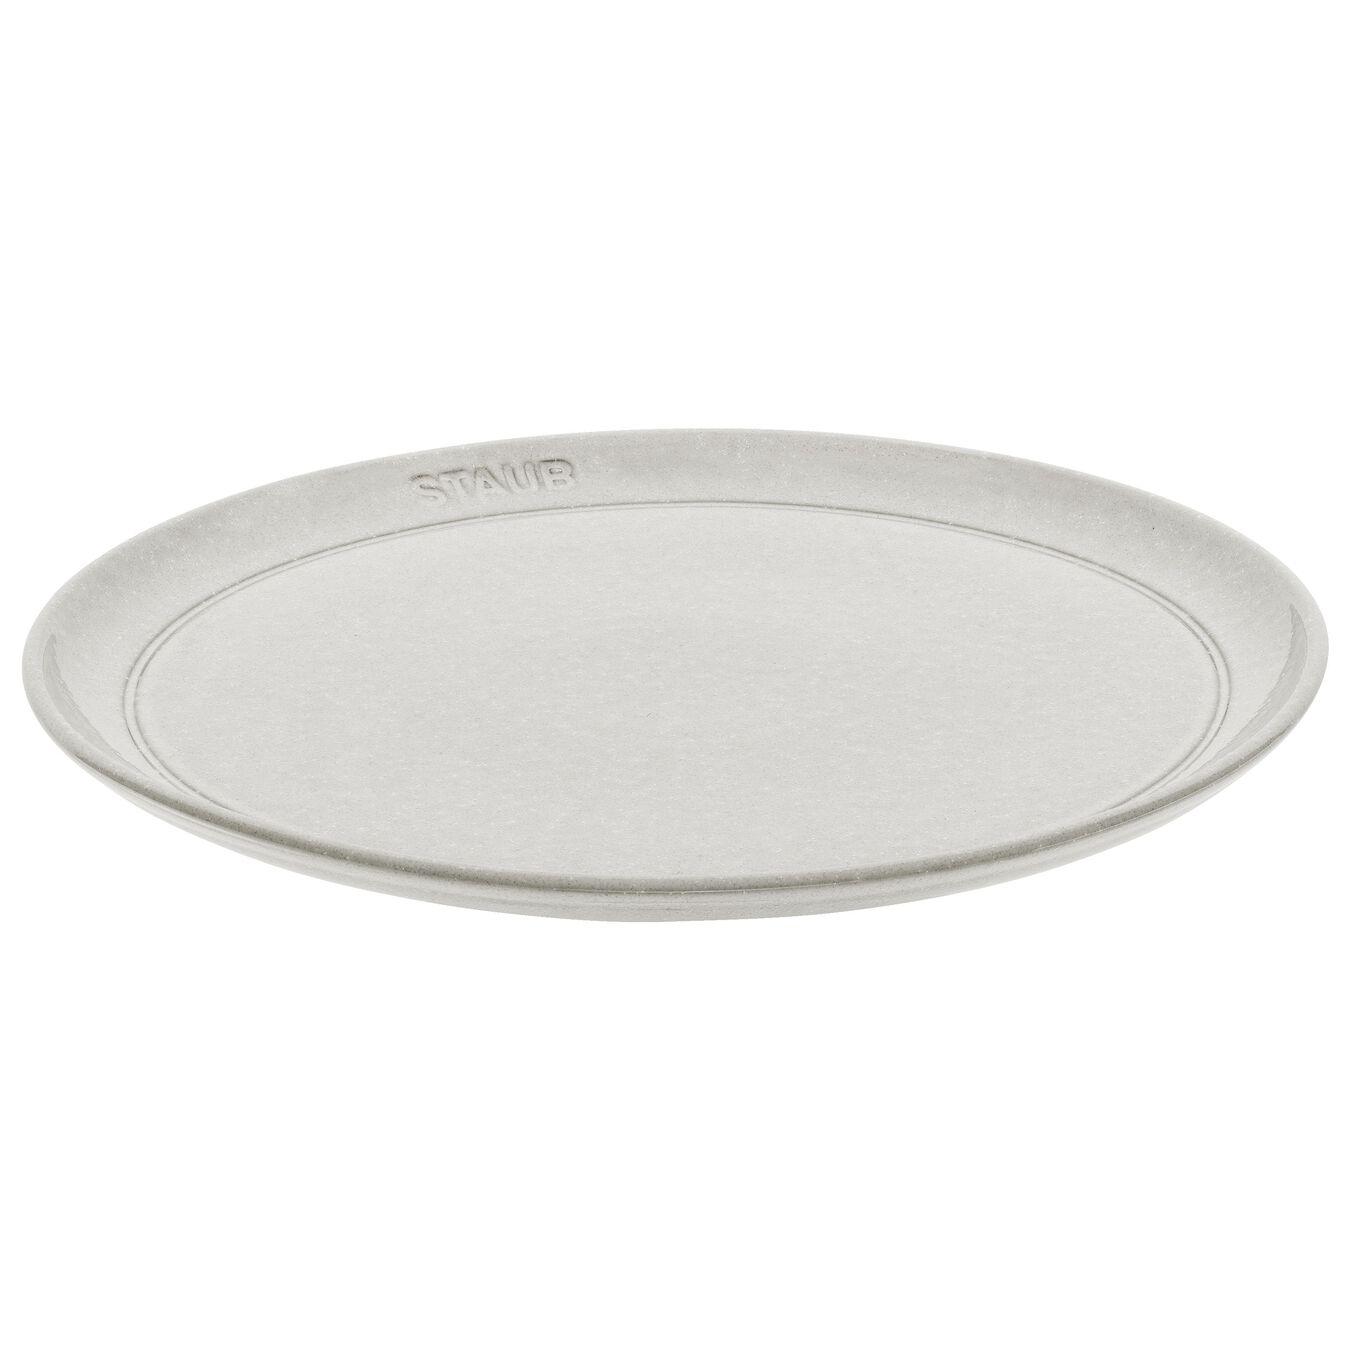 Pasta plate set, 4 Piece | white truffle | ceramic,,large 1